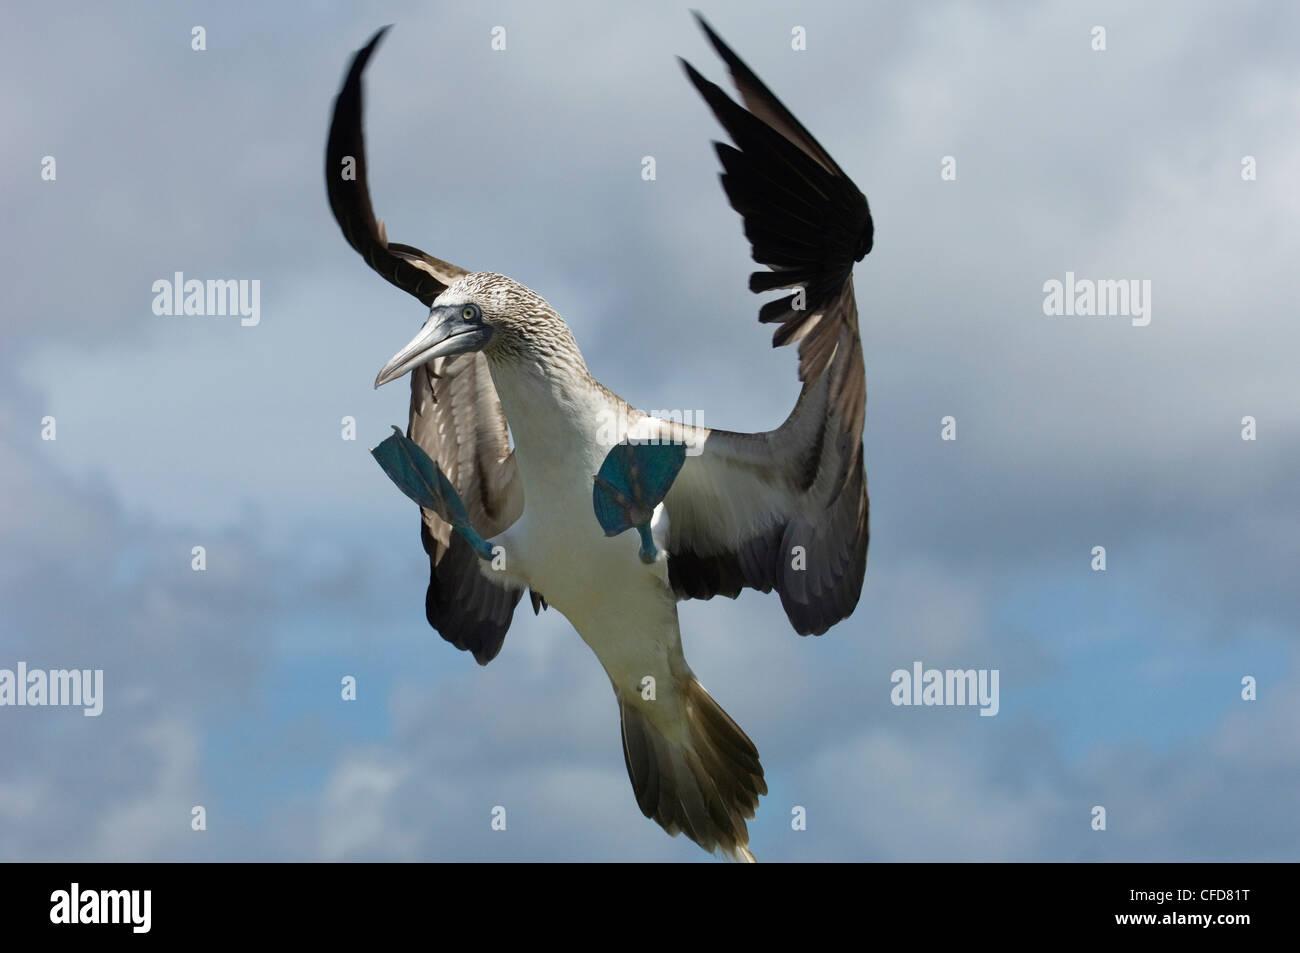 Blue-footed booby, Punto Cevallos, Espanola (Hood) Island, Galapagos Islands, Ecuador, South America. - Stock Image